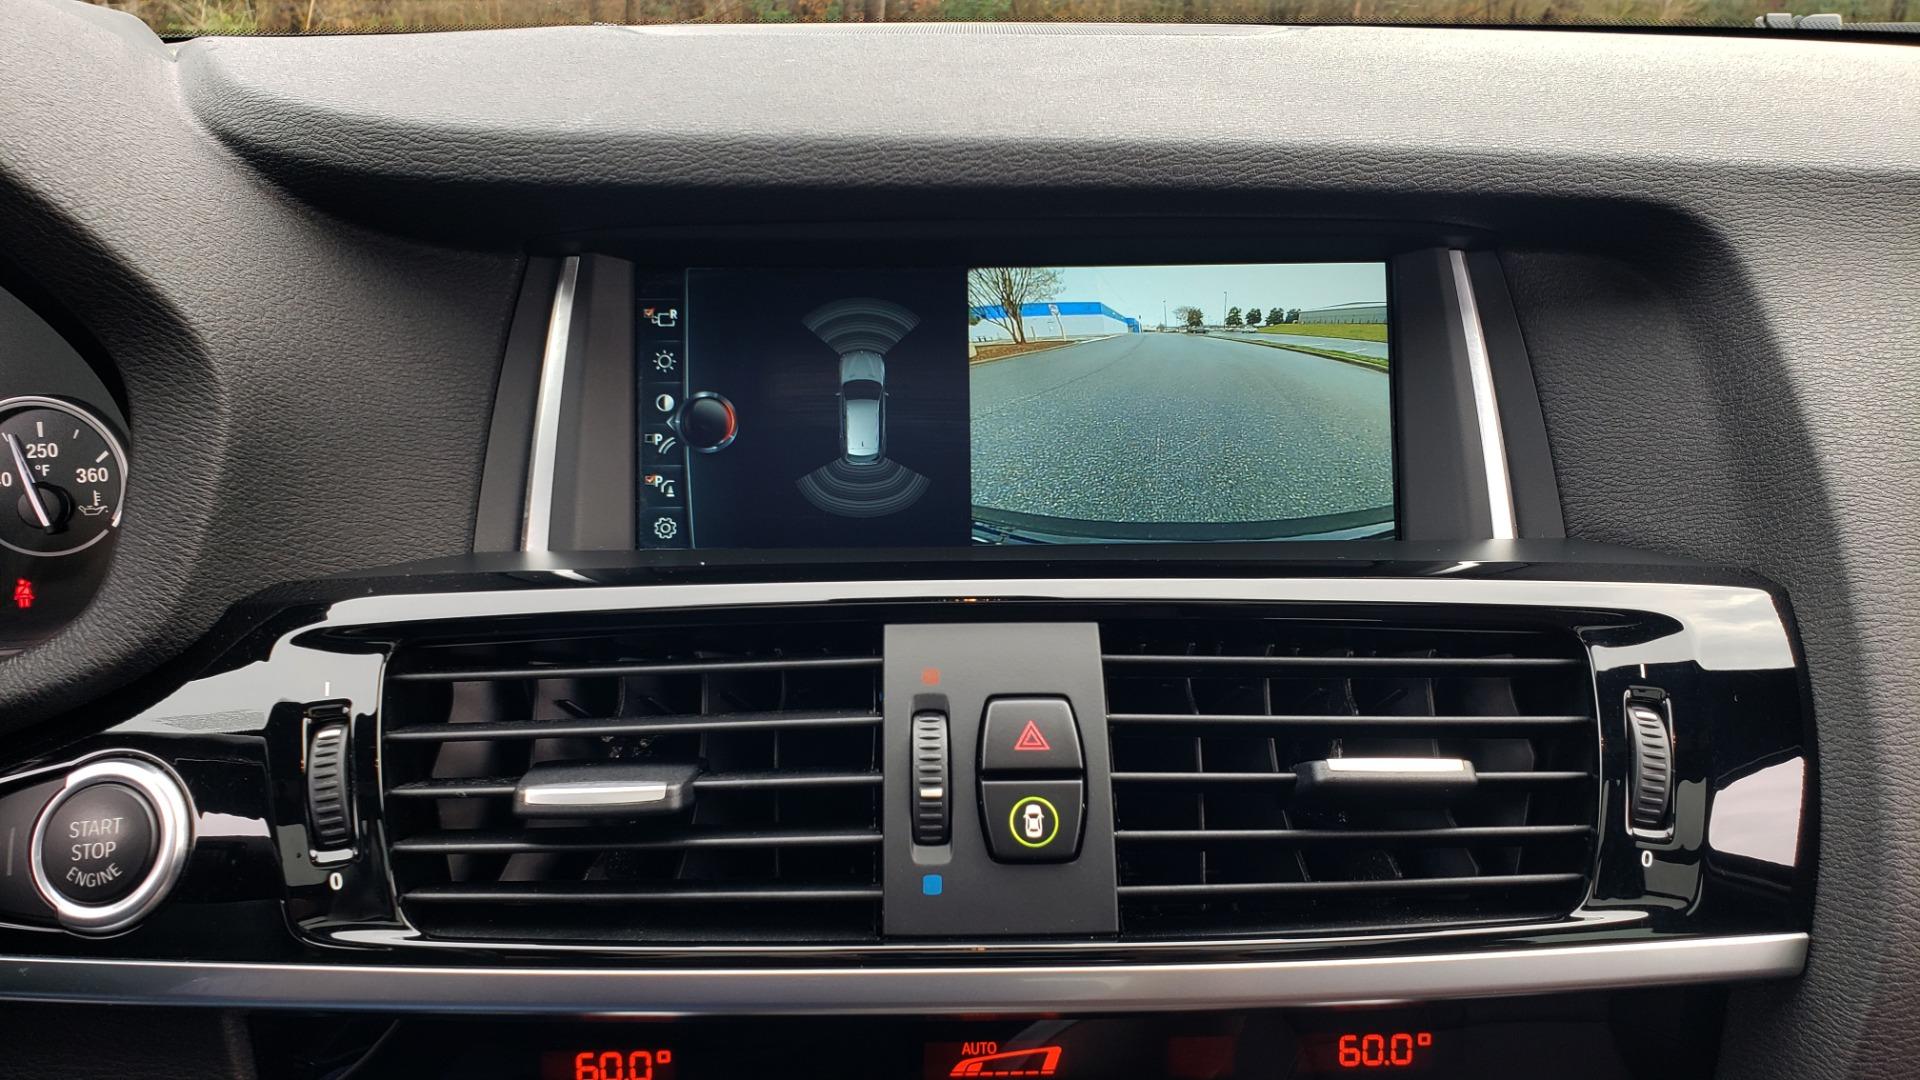 Used 2017 BMW X3 XDRIVE35I M-SPORT / DRVR ASST PLUS / TECHNOLOGY / HUD / BLIND SPOT for sale Sold at Formula Imports in Charlotte NC 28227 45